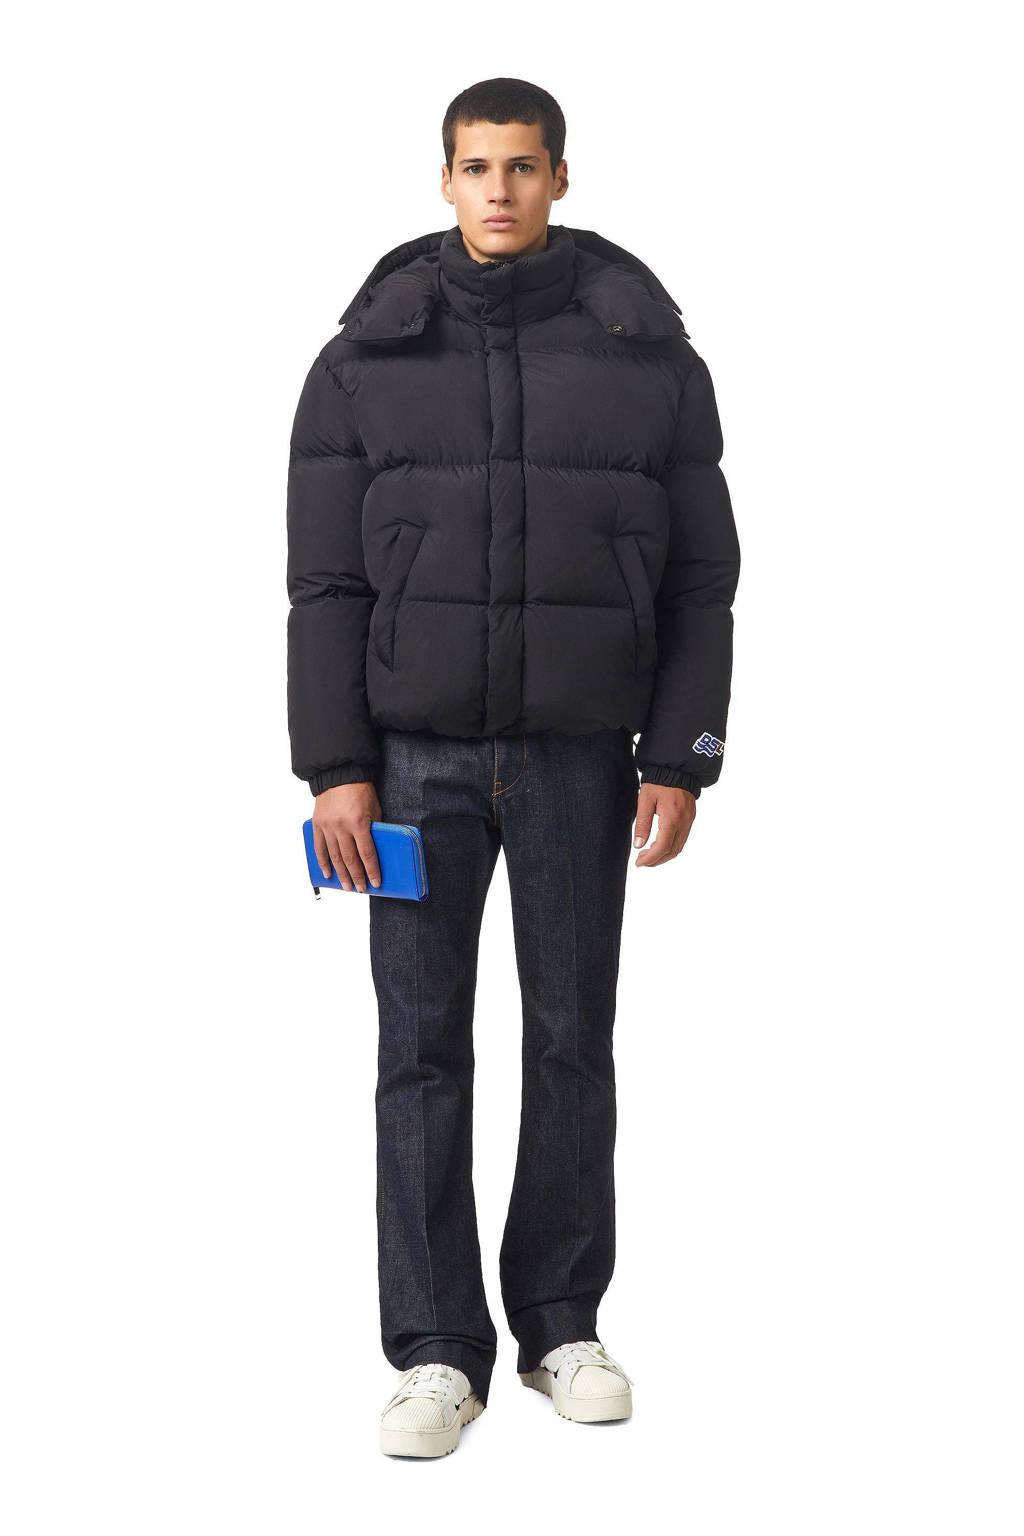 Diesel  jas W-ROLF 9xx black, 9XX Black